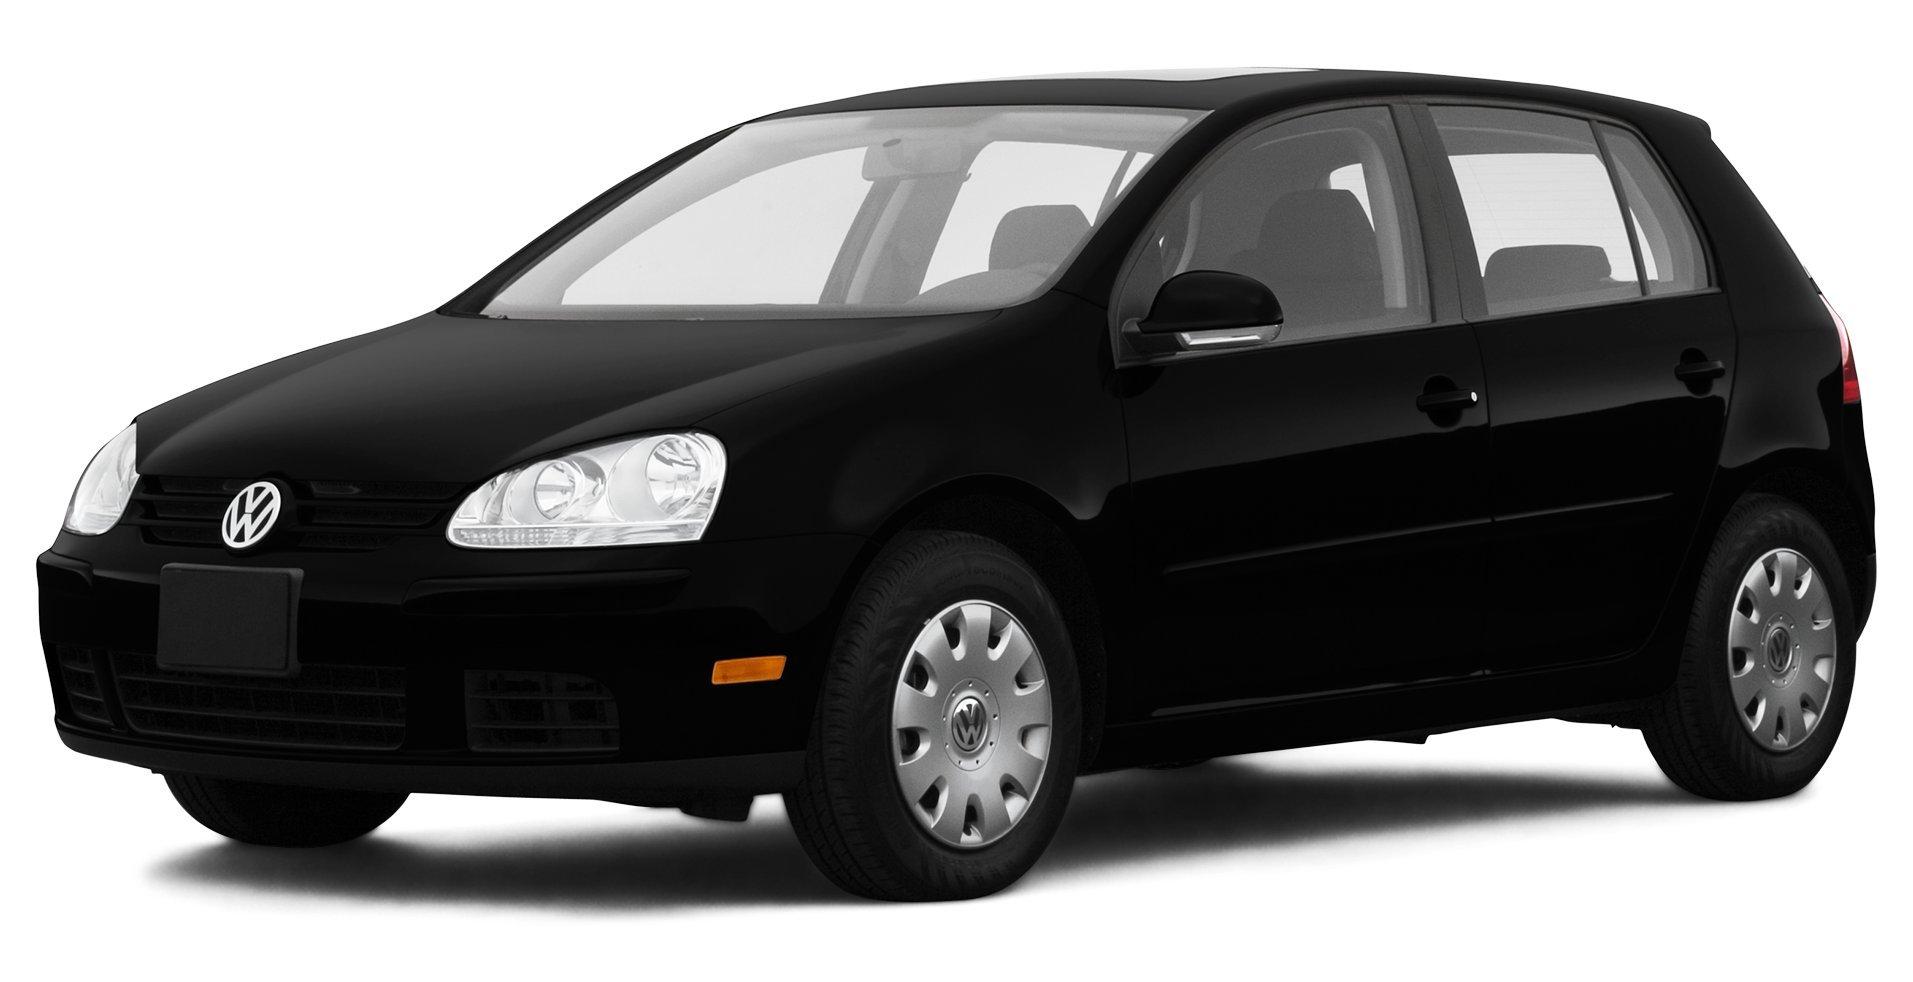 2007 Hyundai Sonata GLS, 4-Door Sedan Automatic Transmission, 2007  Volkswagen Rabbit, 4-Door Hatchback Automatic Transmission ...